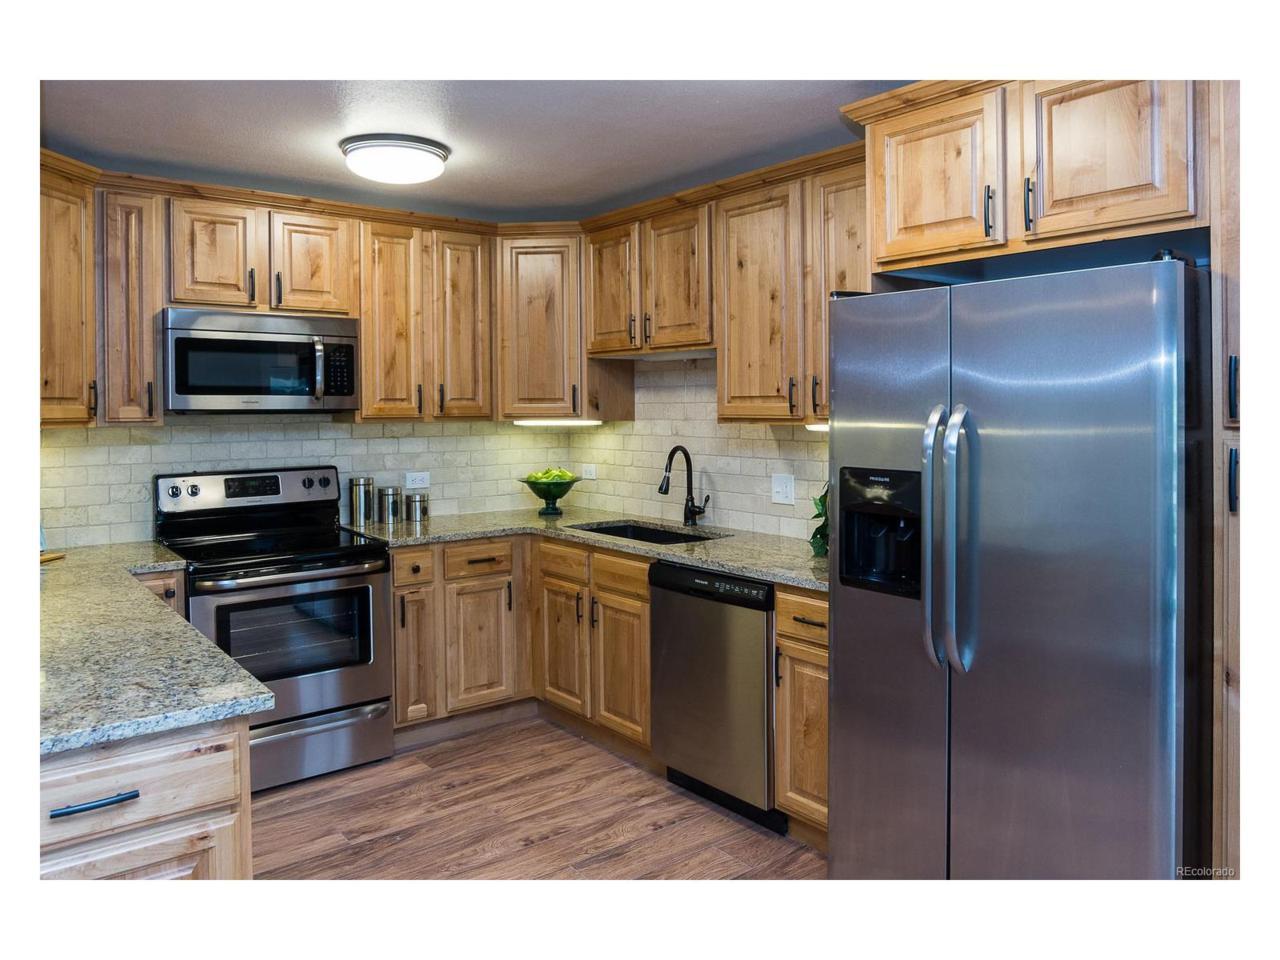 675 S Alton Way 5C, Denver, CO 80247 (MLS #4955975) :: 8z Real Estate